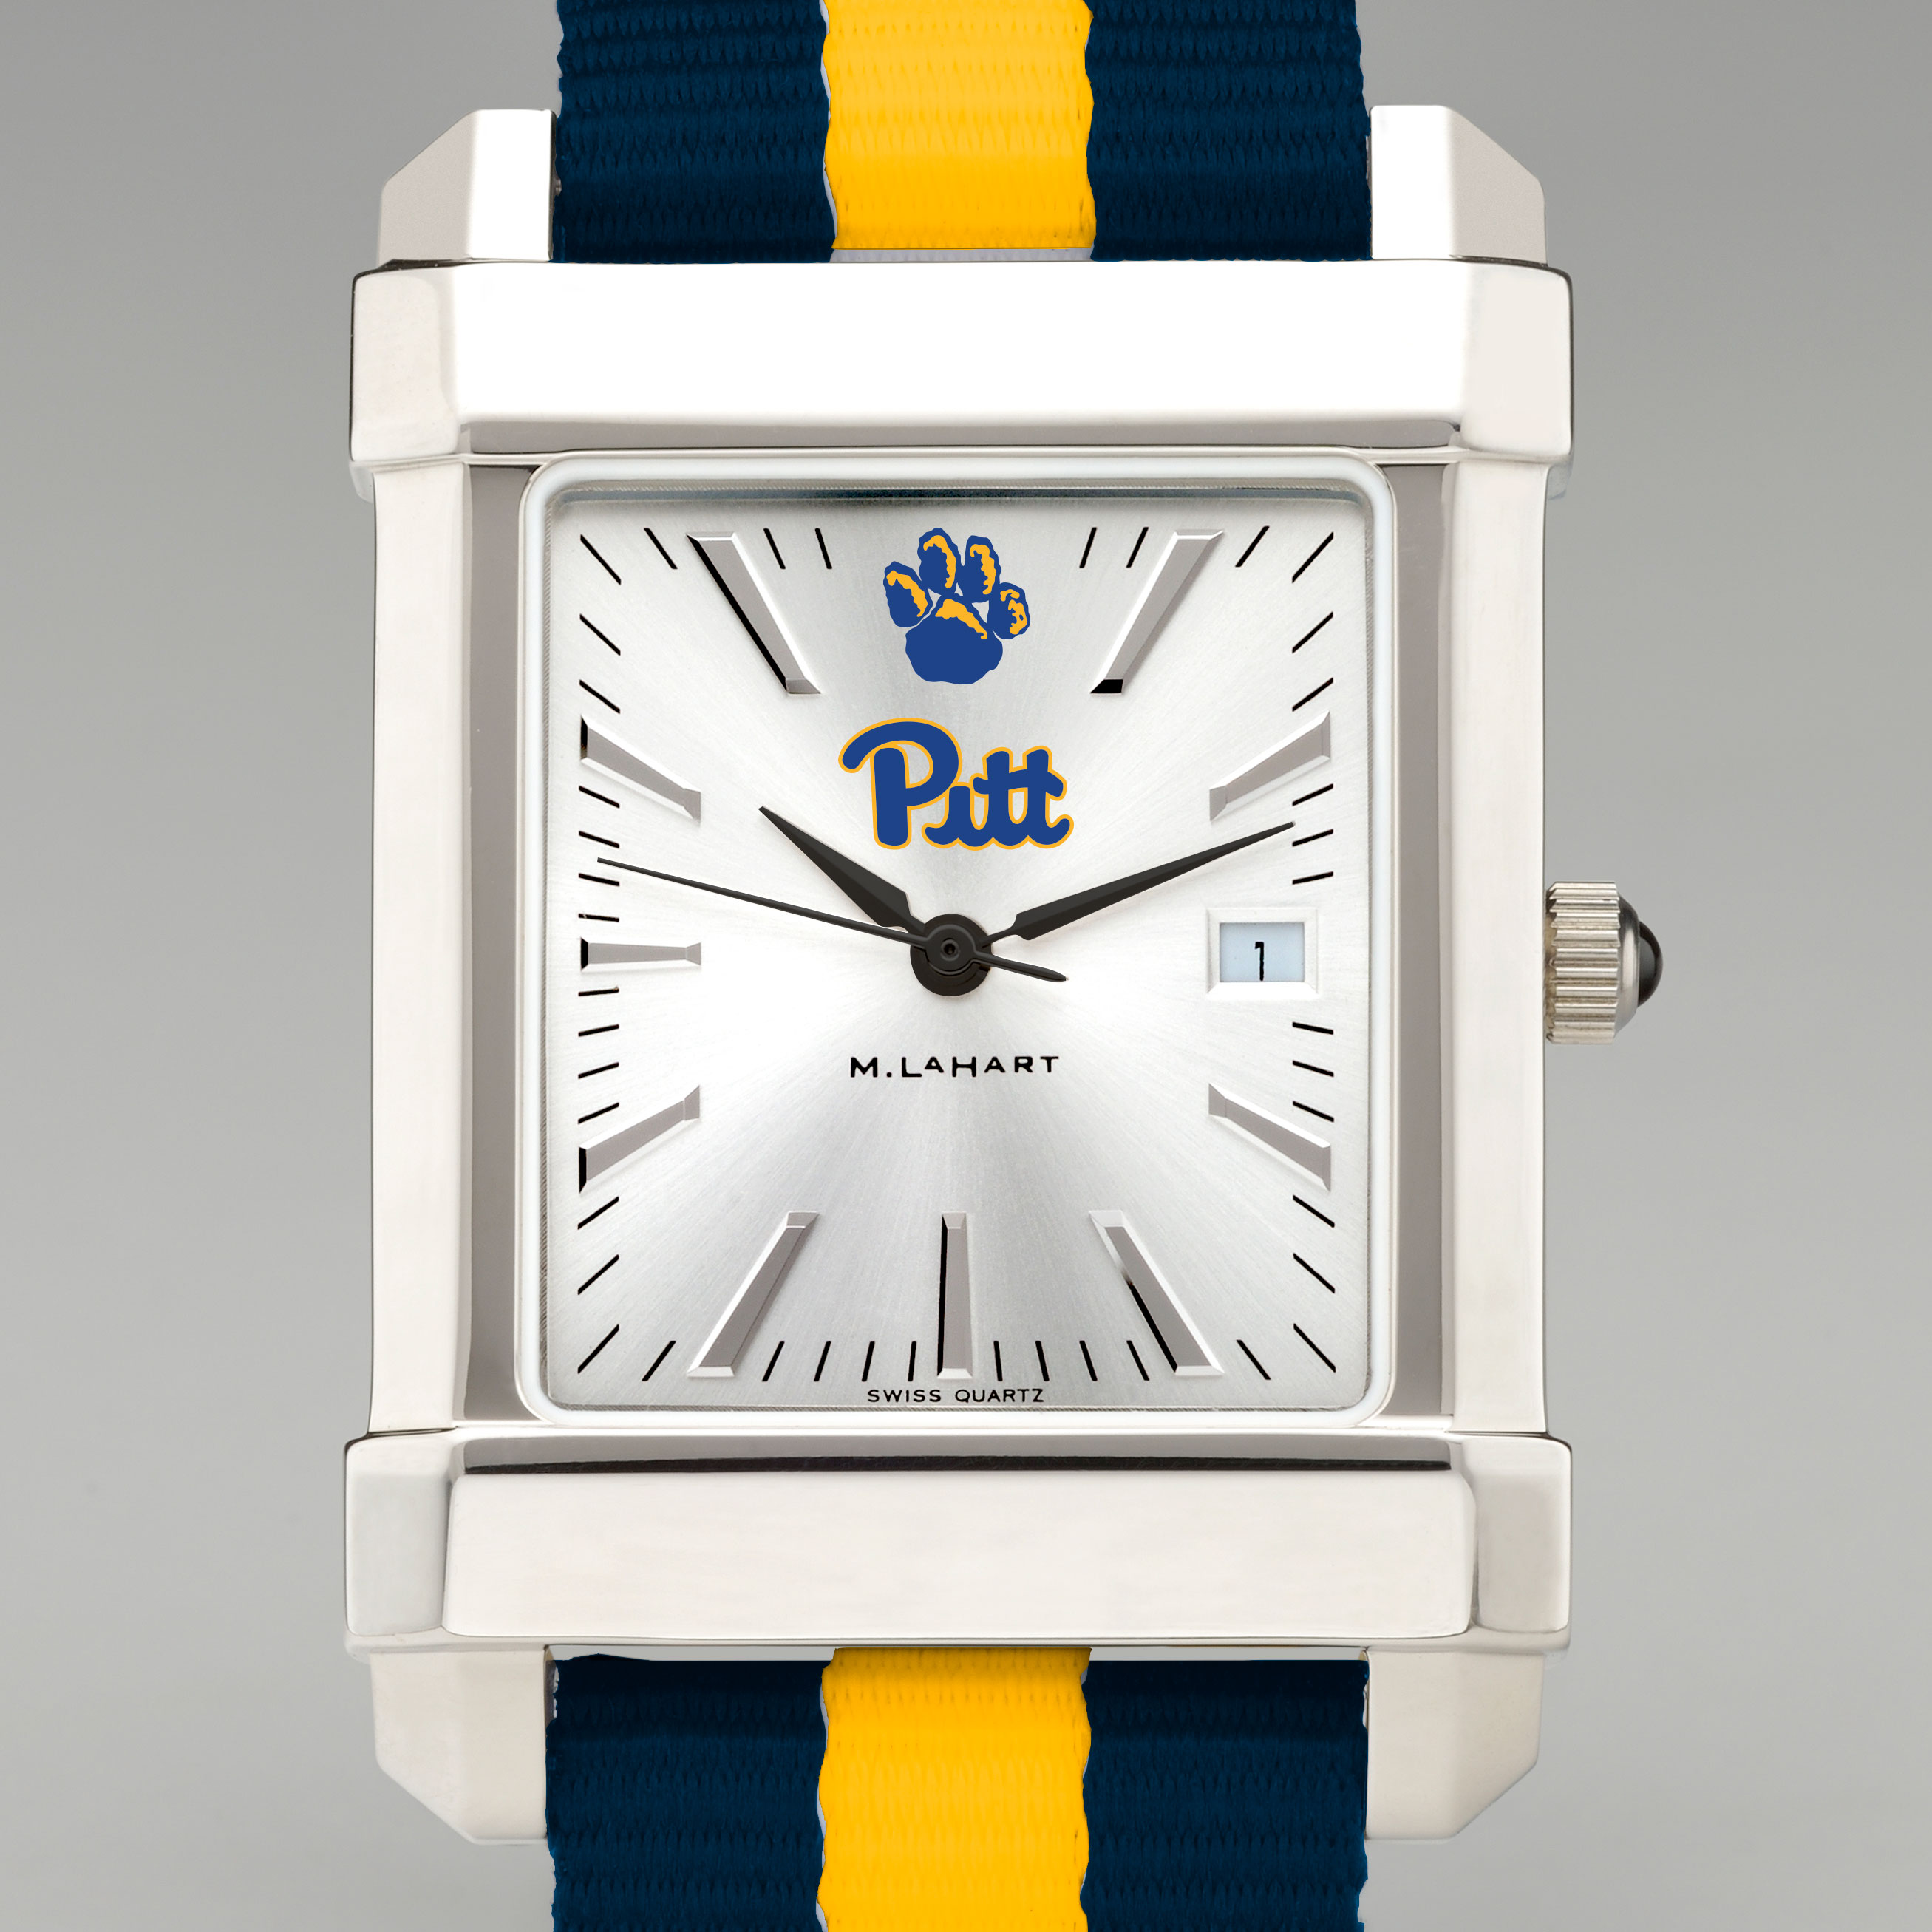 Pitt Men's Collegiate Watch w/ NATO Strap